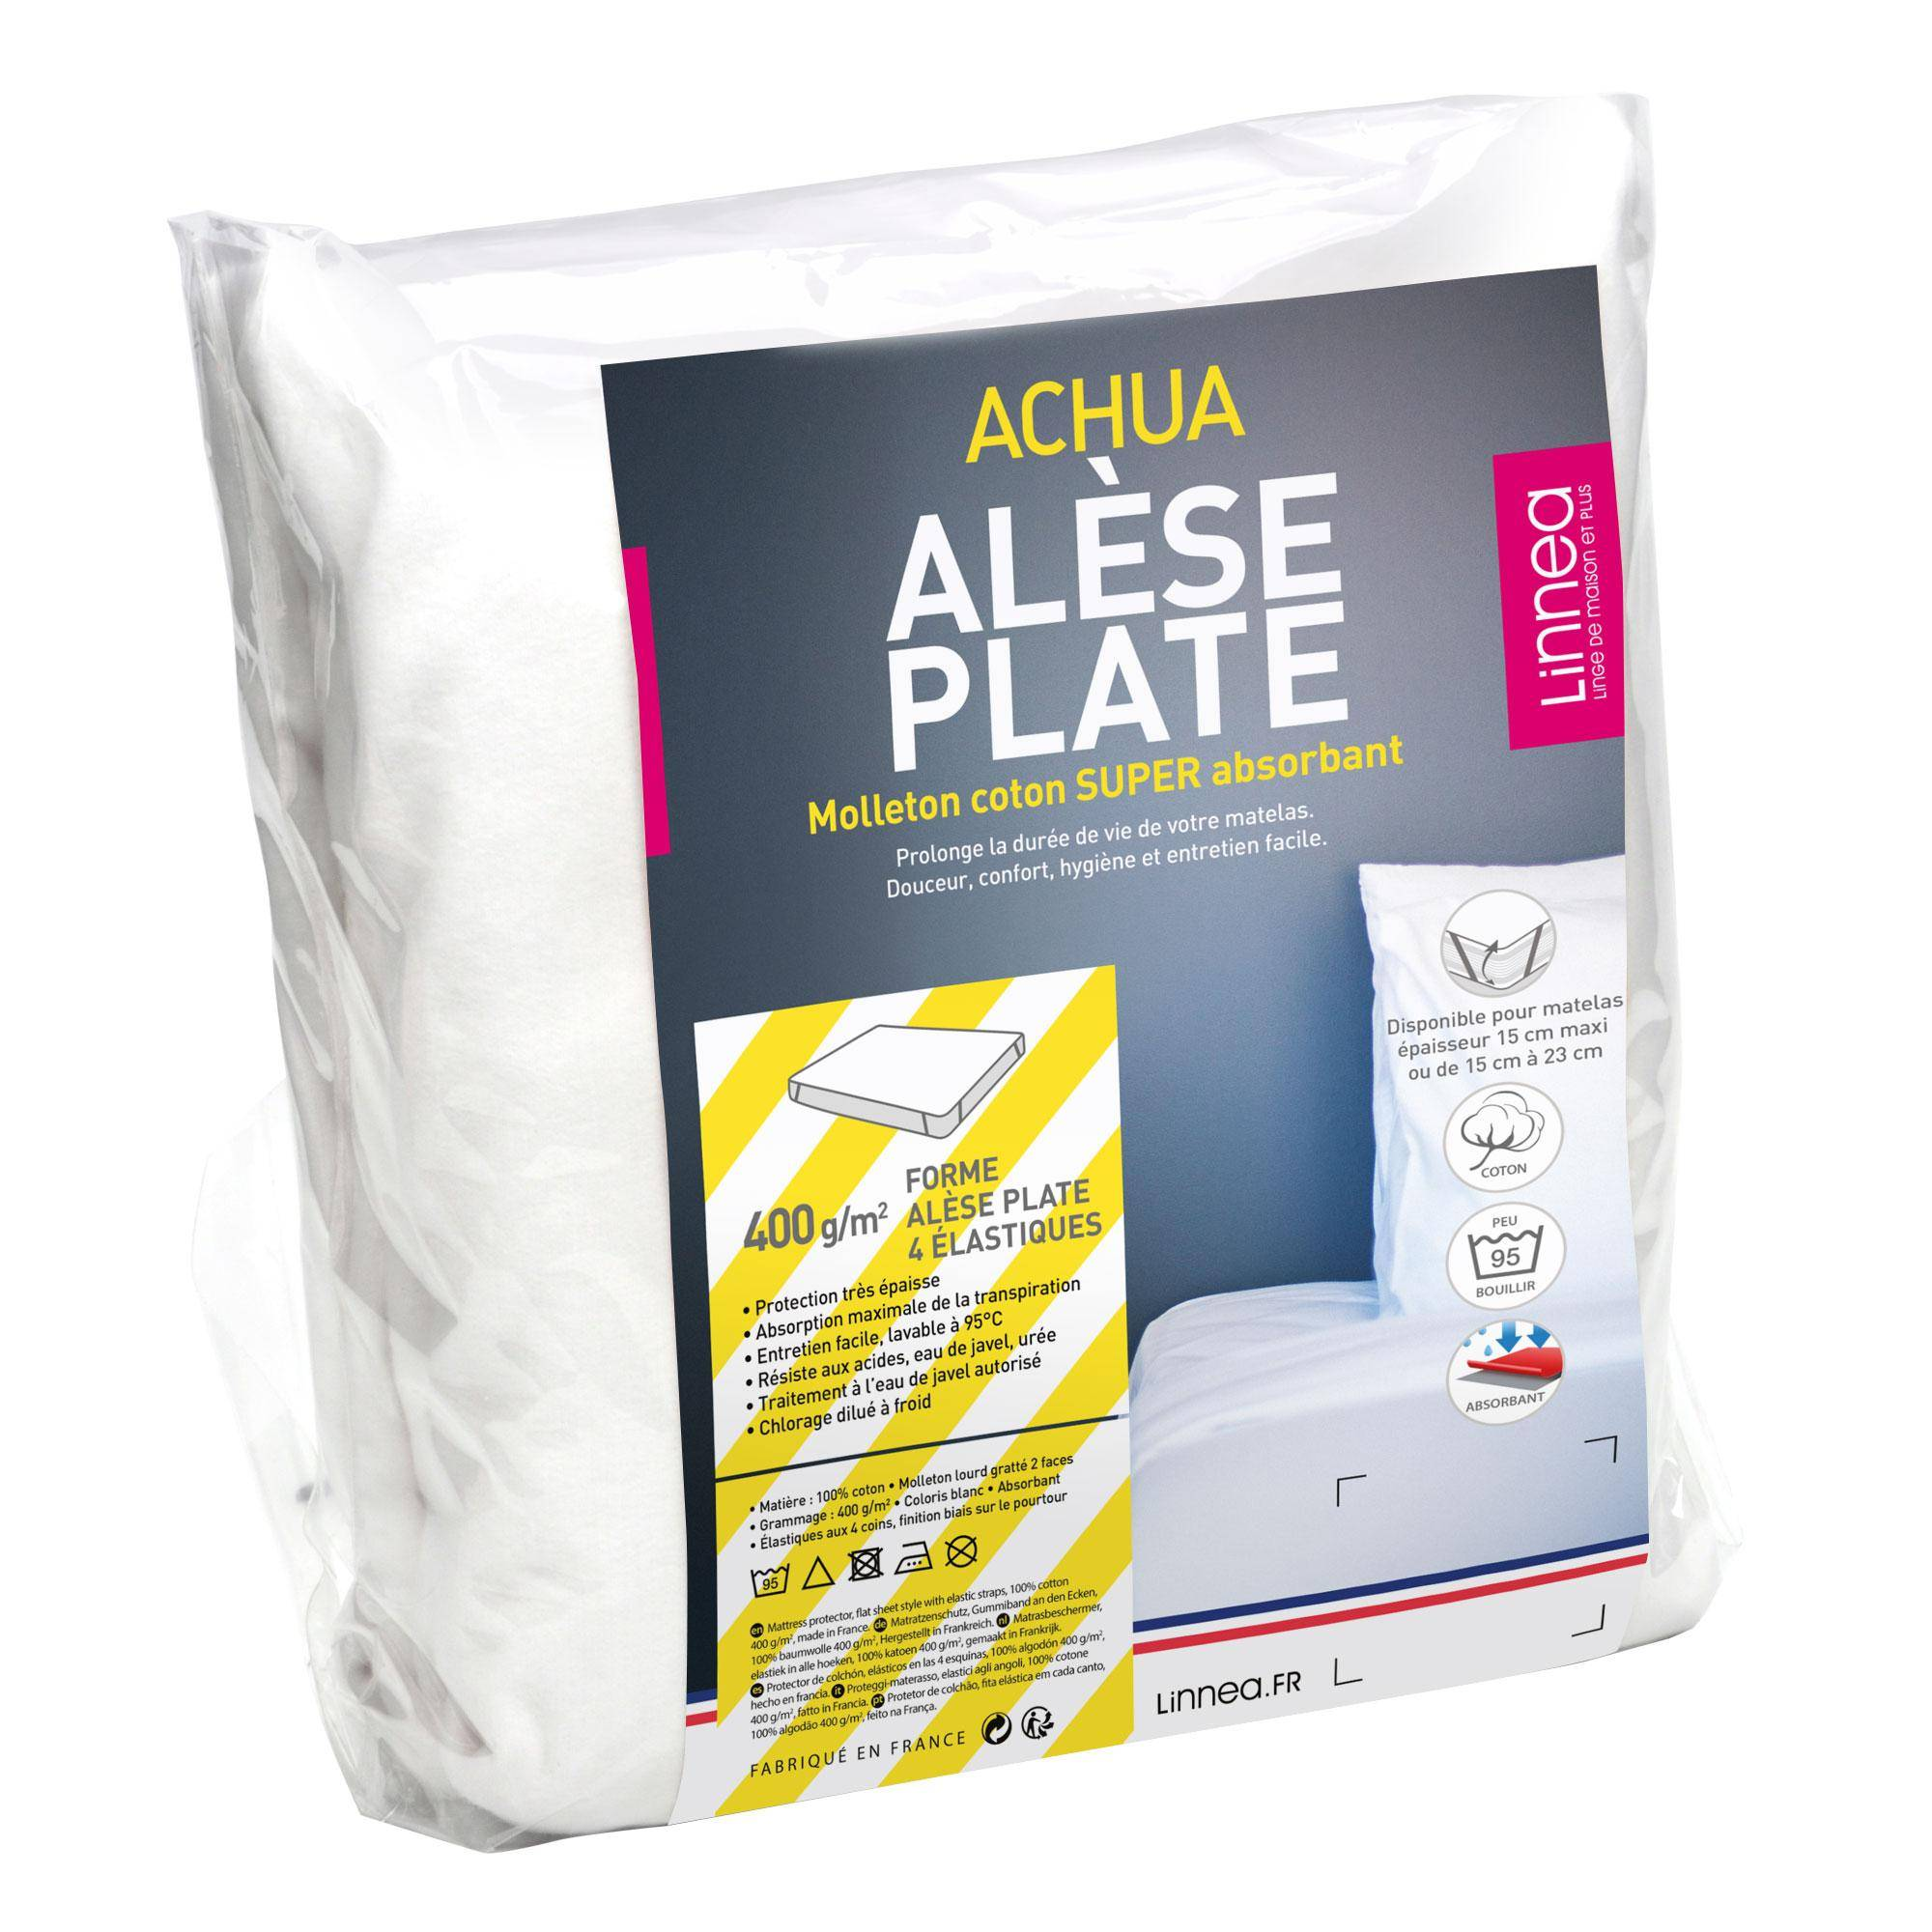 Linnea Alèse plate 60x140 cm ACHUA Molleton 100% coton 400 g/m2 matelas 15cm maxi